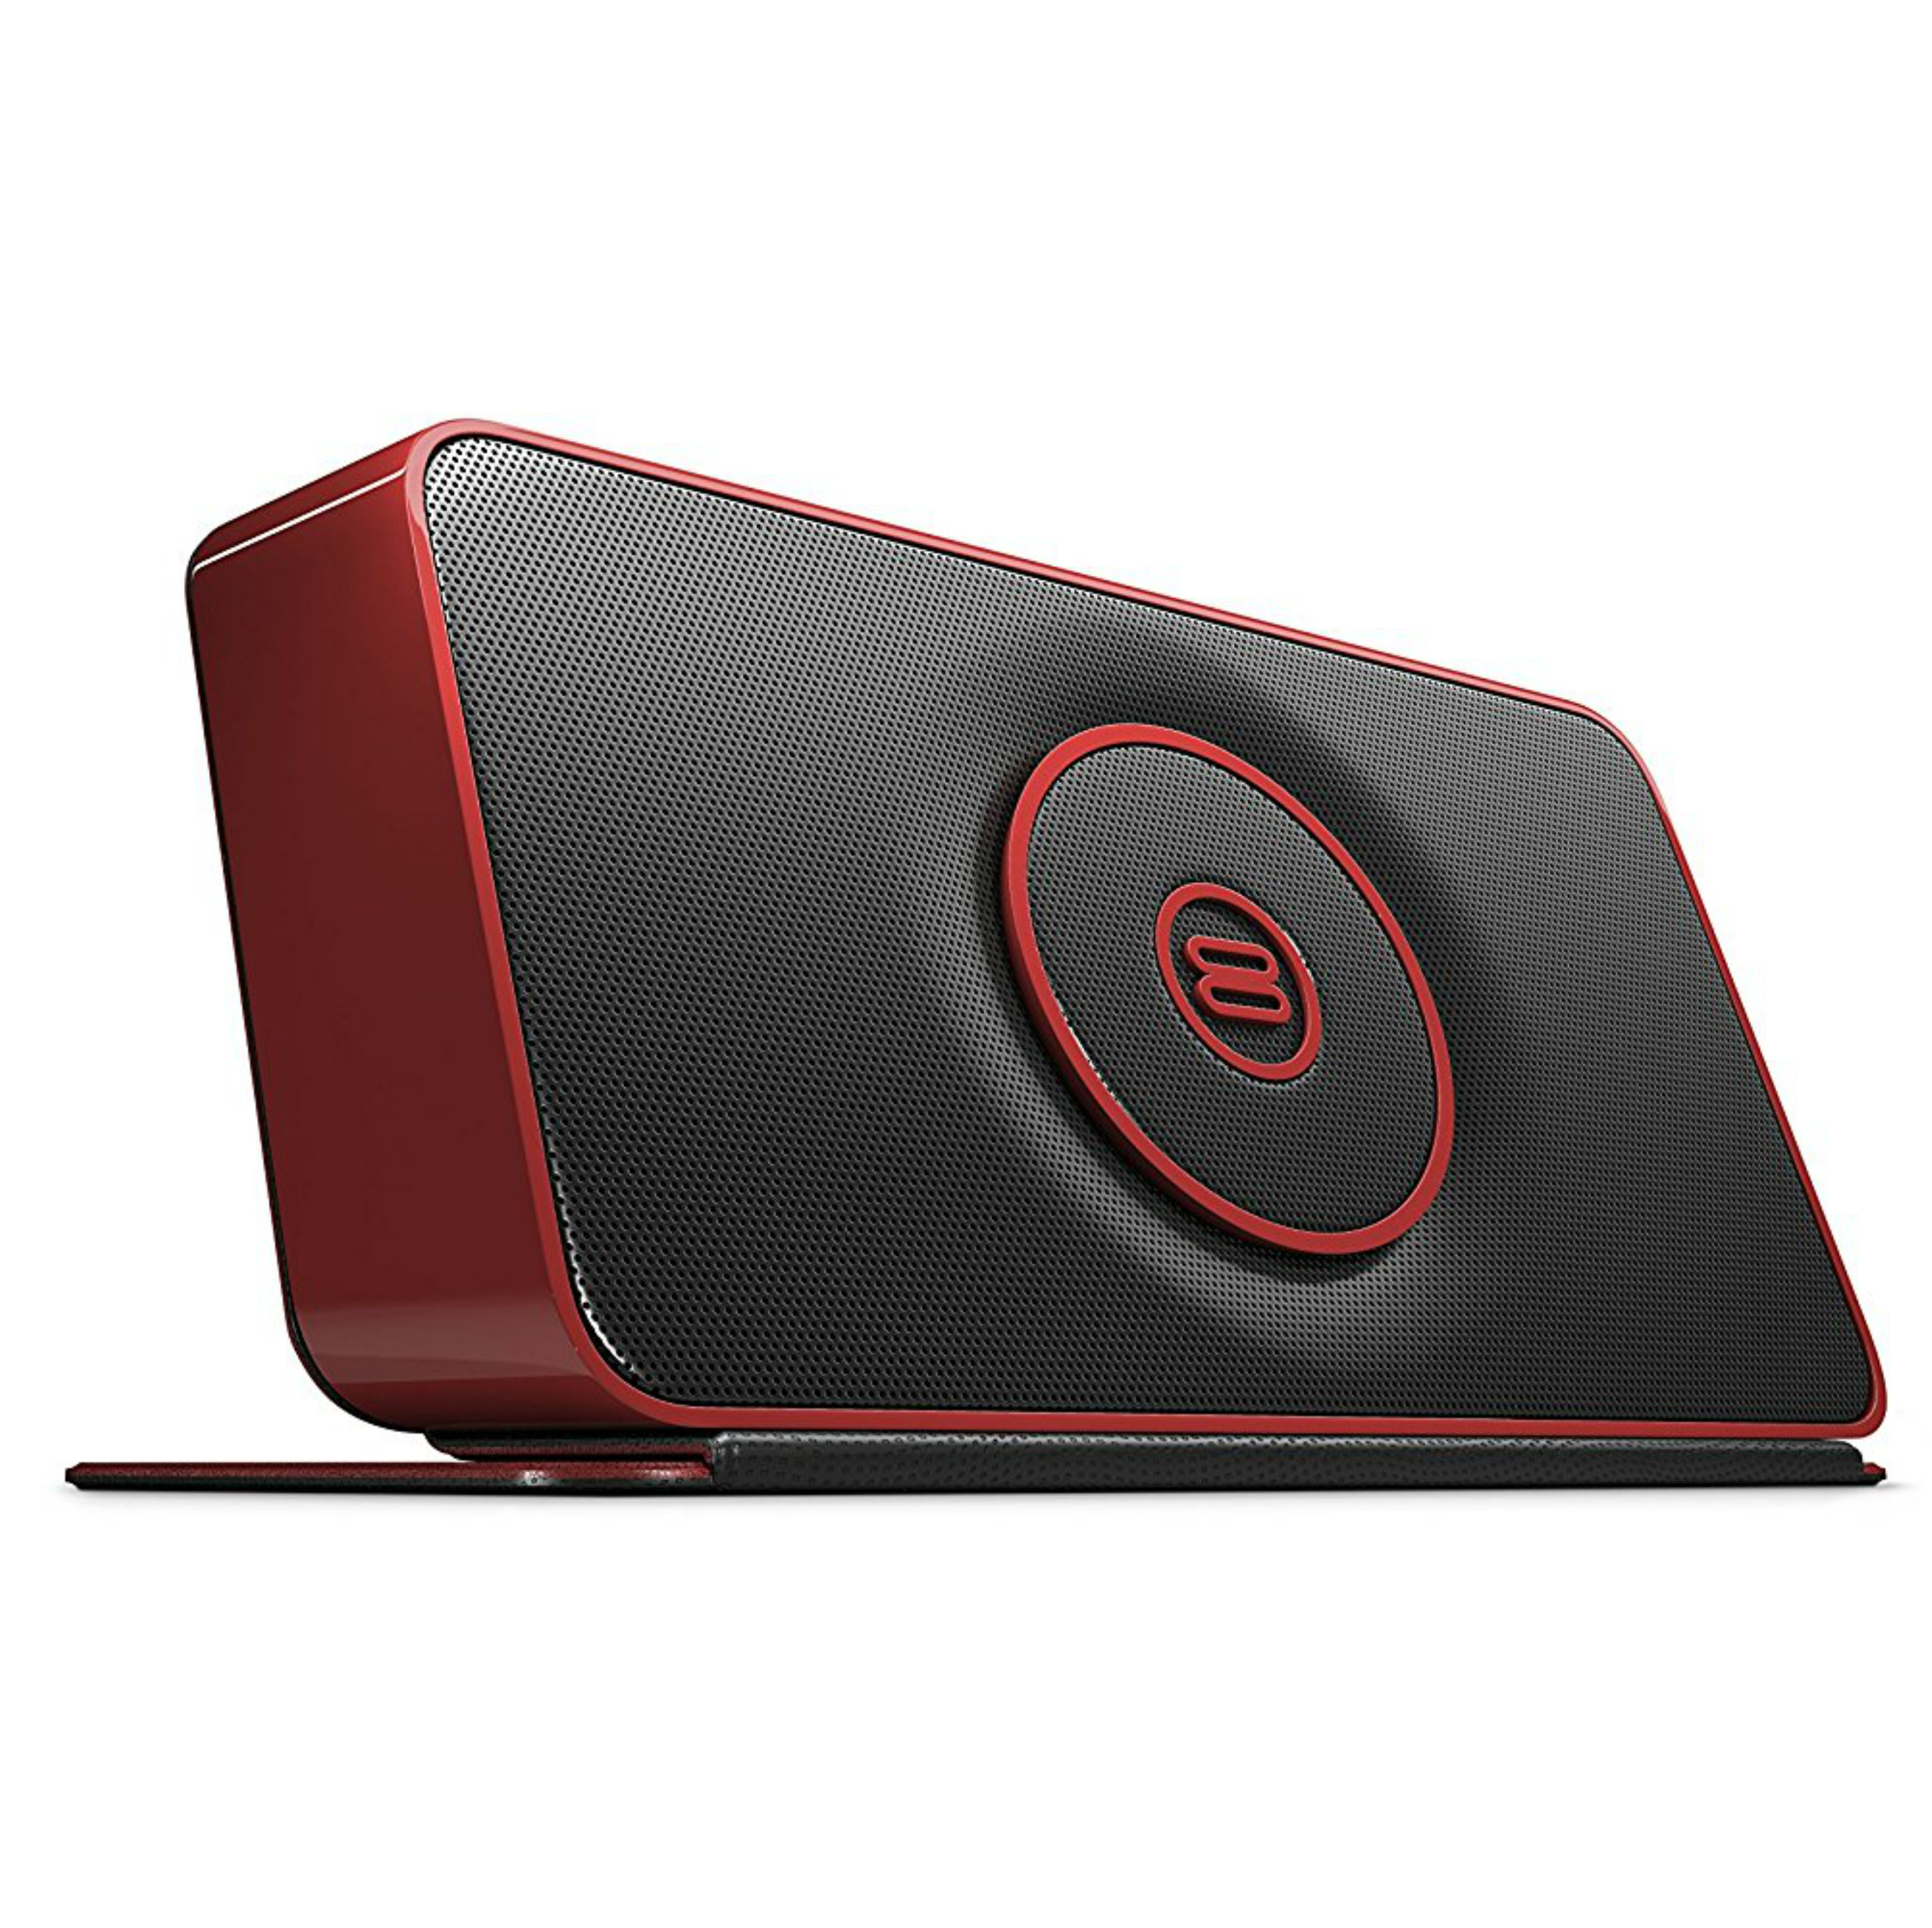 Bayan Audio|Soundbook Go Portable Bluetooth Wireless Speaker|NFC Pairing - Red